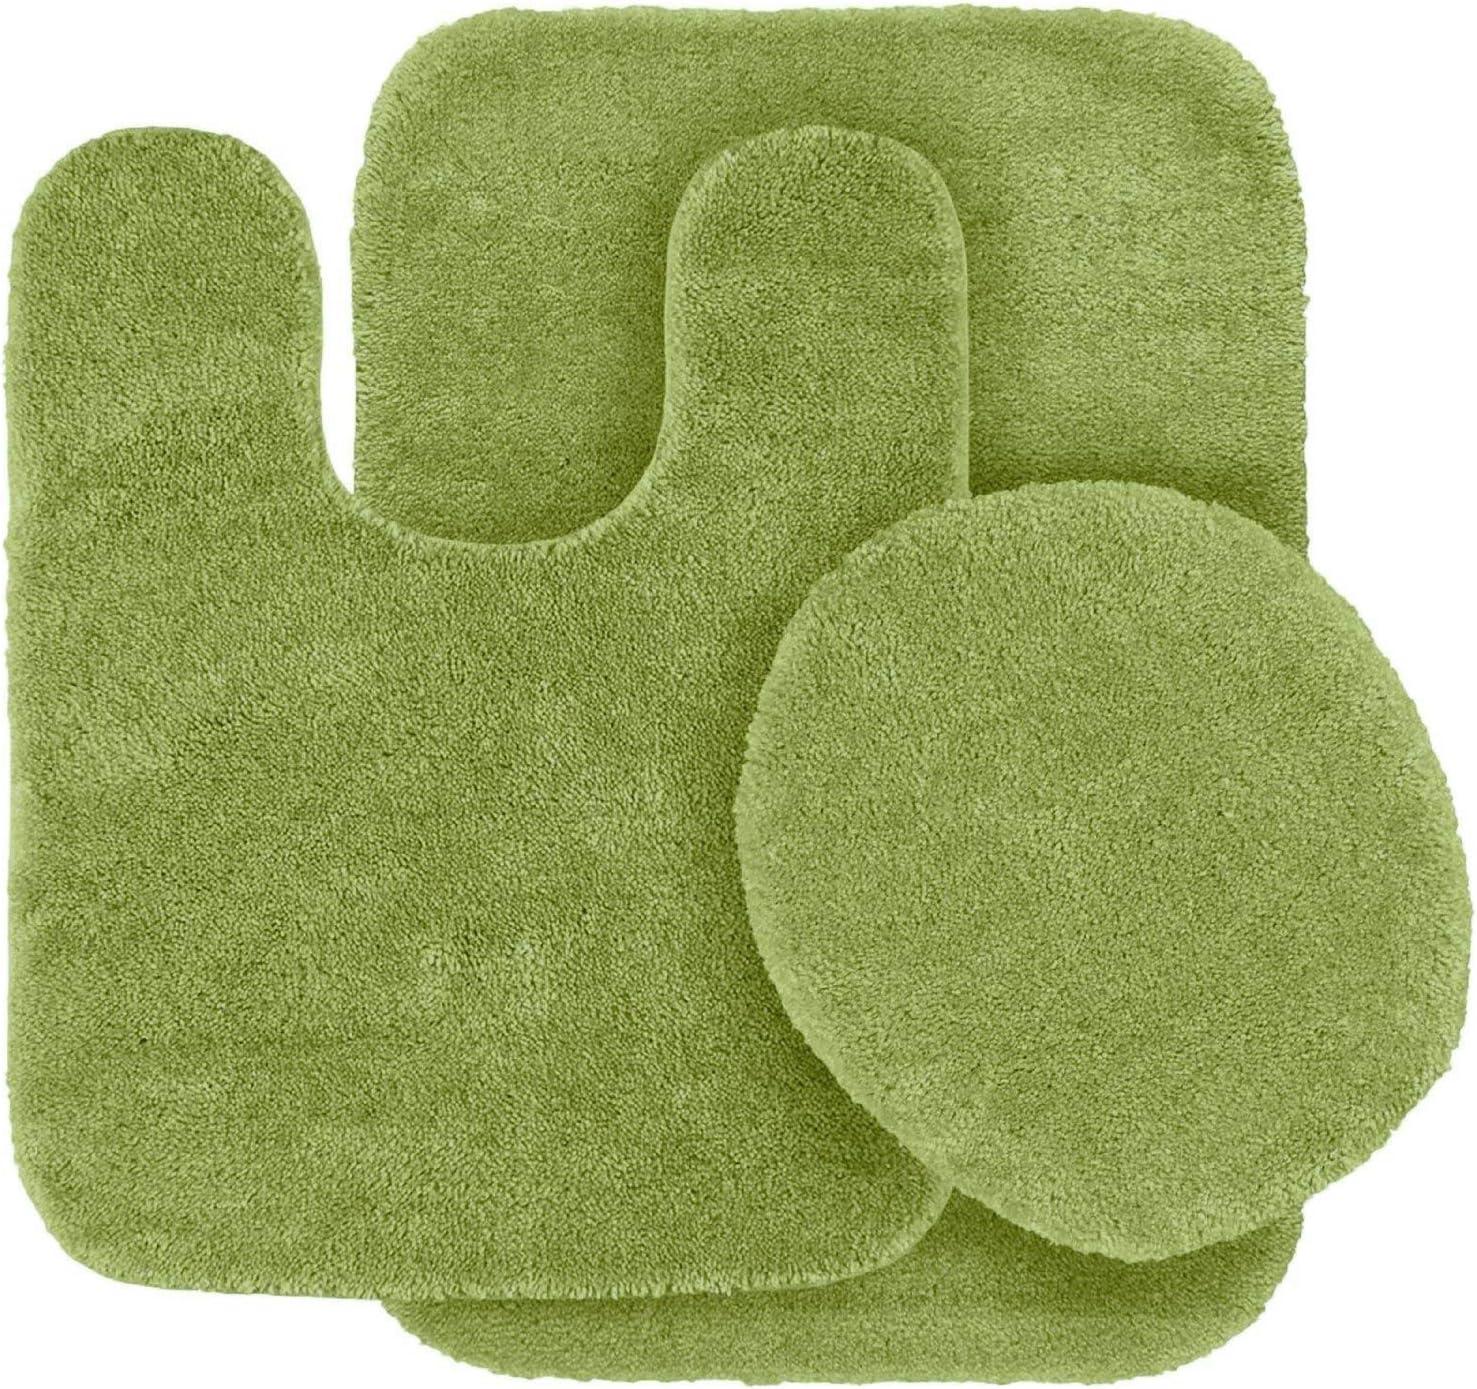 3 pc Solid Sage Green Bathroom Rug Set Bath Mats Bath Set Super Soft Anti Slip Soft Mats New